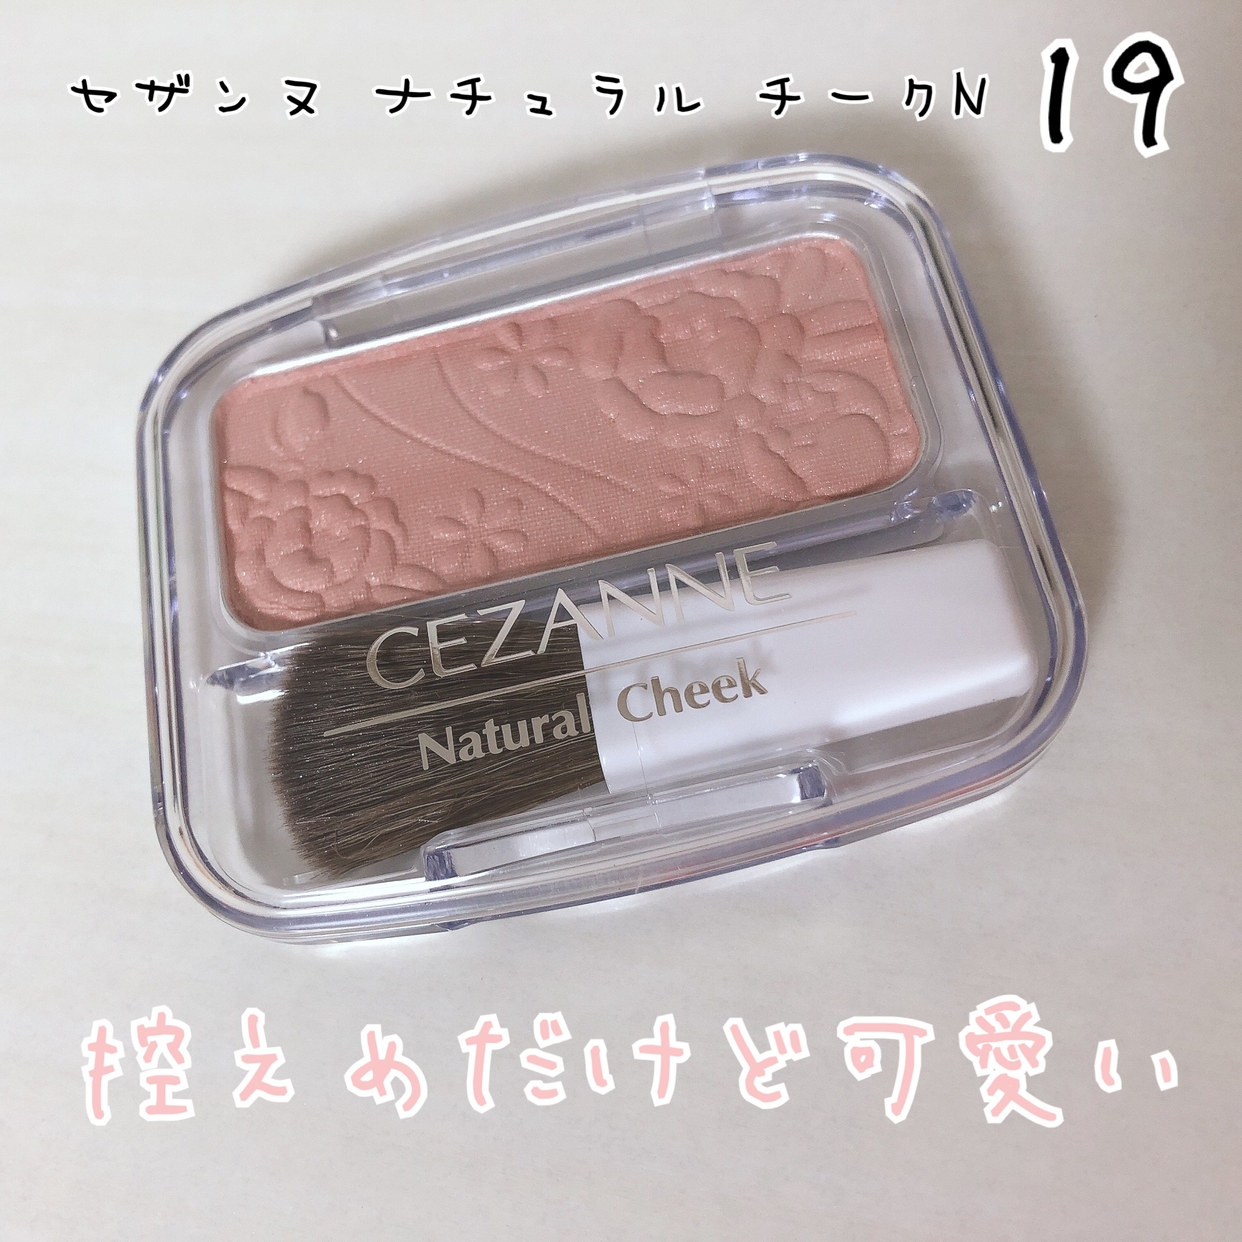 CEZANNE(セザンヌ) ナチュラル チークNを使った桜羽さんのクチコミ画像1